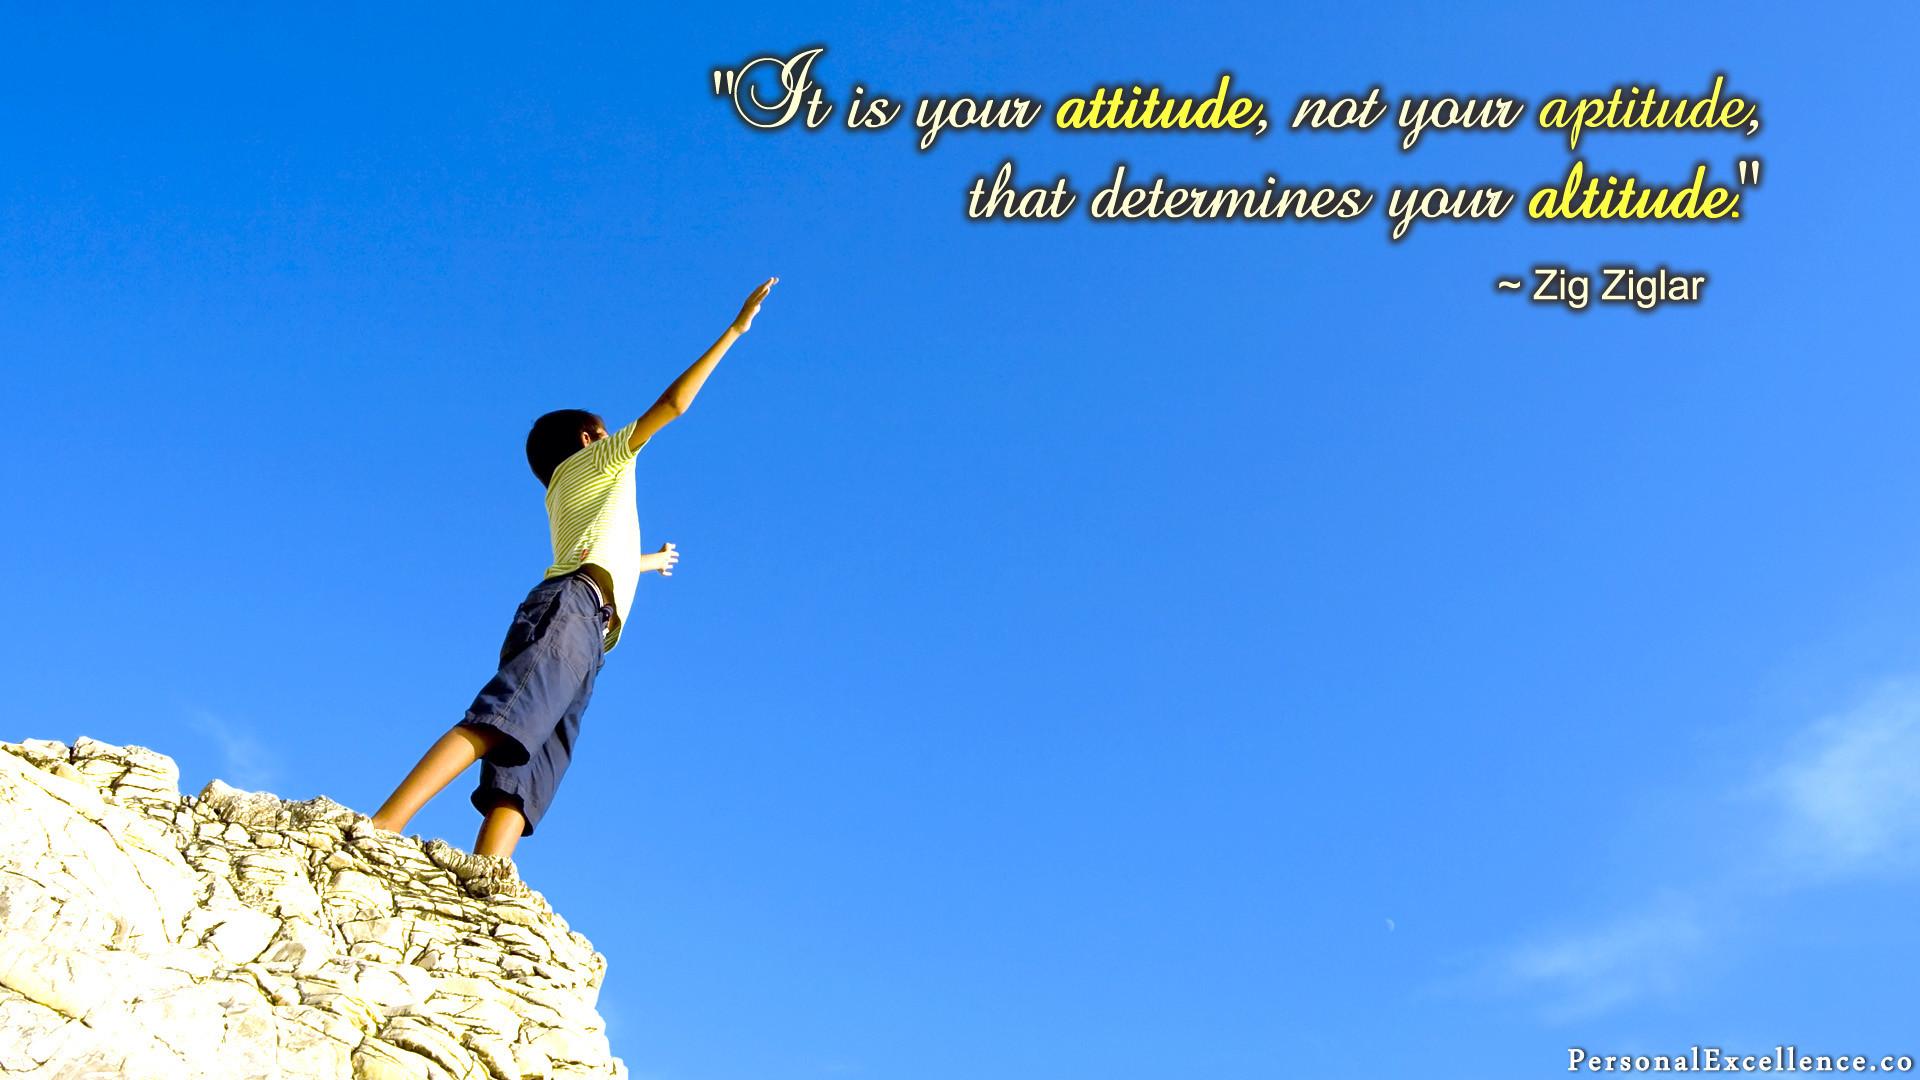 "1. [Attitude, not Altitude] Wallpaper. """